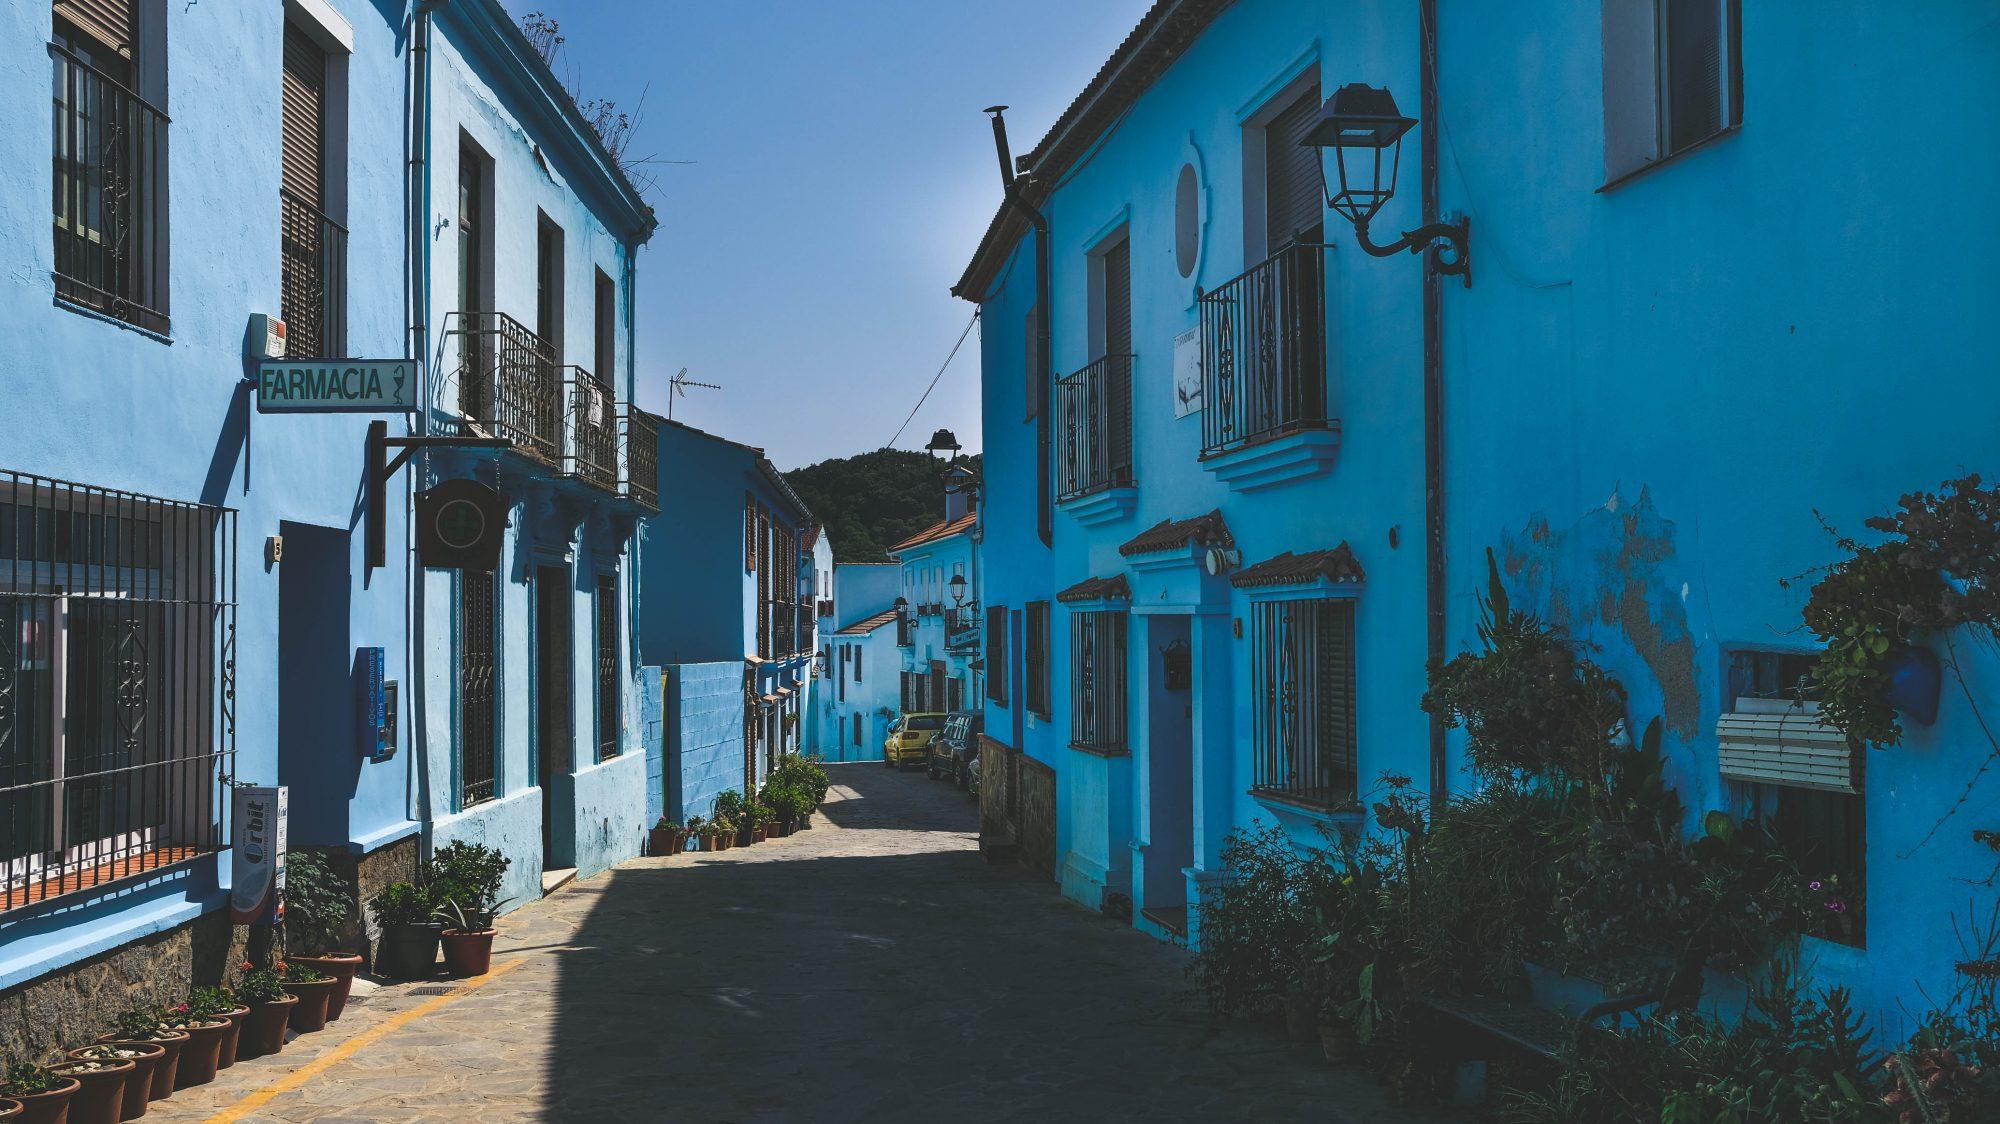 Juzcar du milieu - Juzcar, Espagne